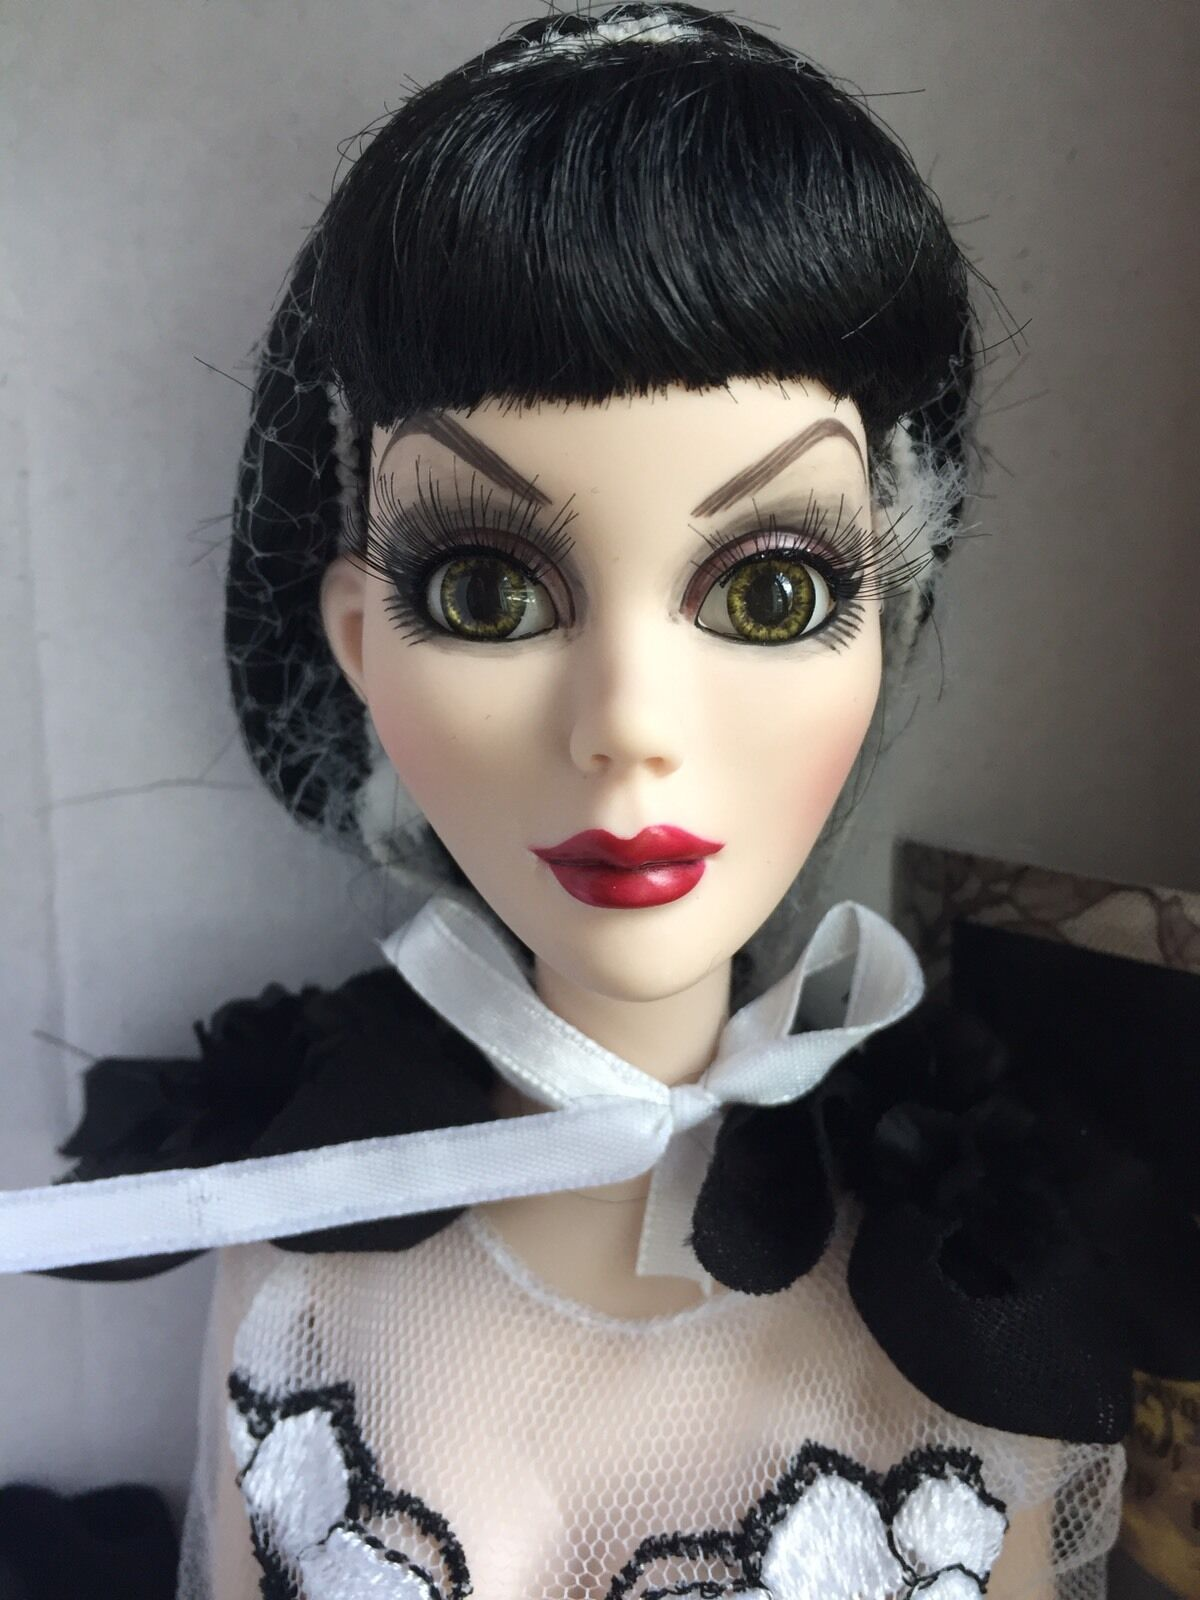 Tonner Wilde Imagination Evangeline Orribile da Sera Night Shade 18.5   Bambola